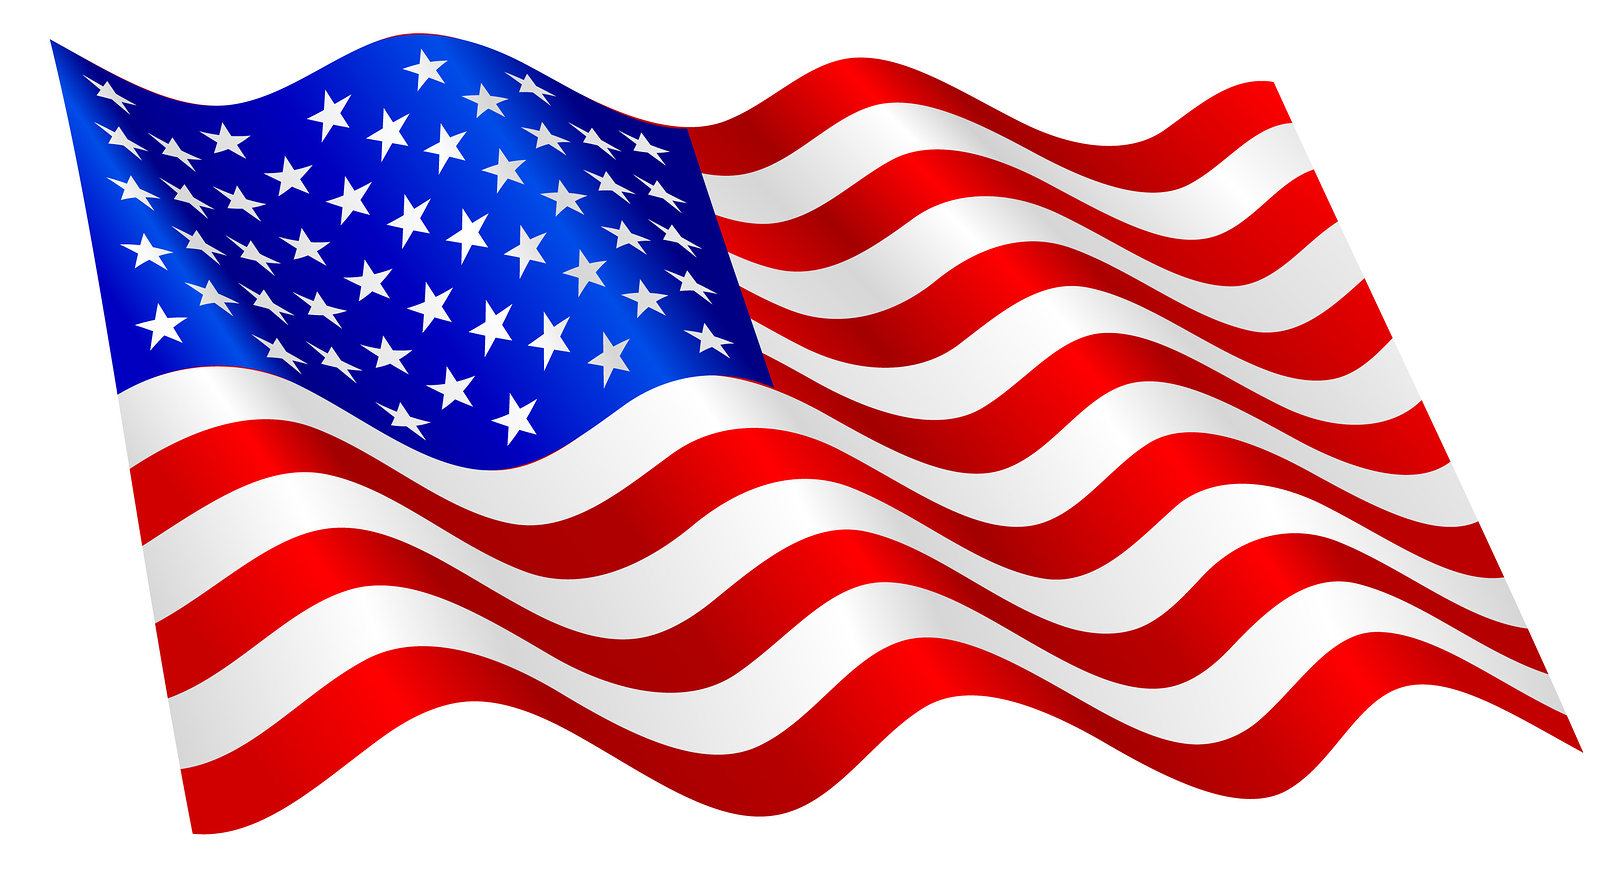 Waving us flag clipart vector royalty free download American Flag Clip Art & American Flag Clip Art Clip Art Images ... vector royalty free download